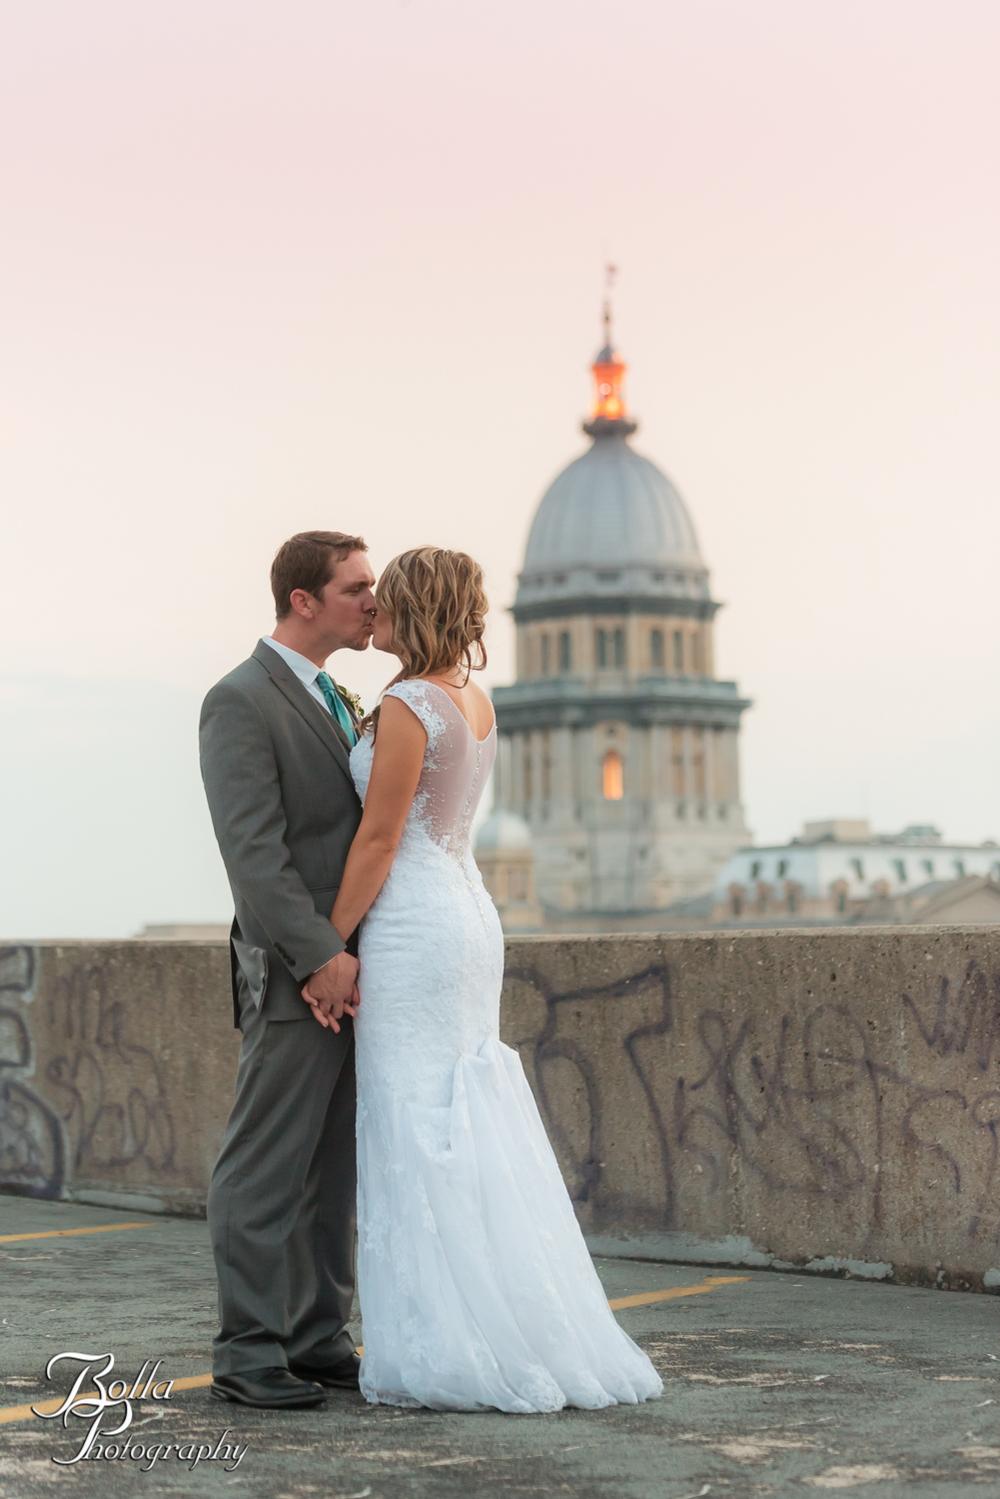 Bolla_Photography_St_Louis_wedding_photographer-0421.jpg